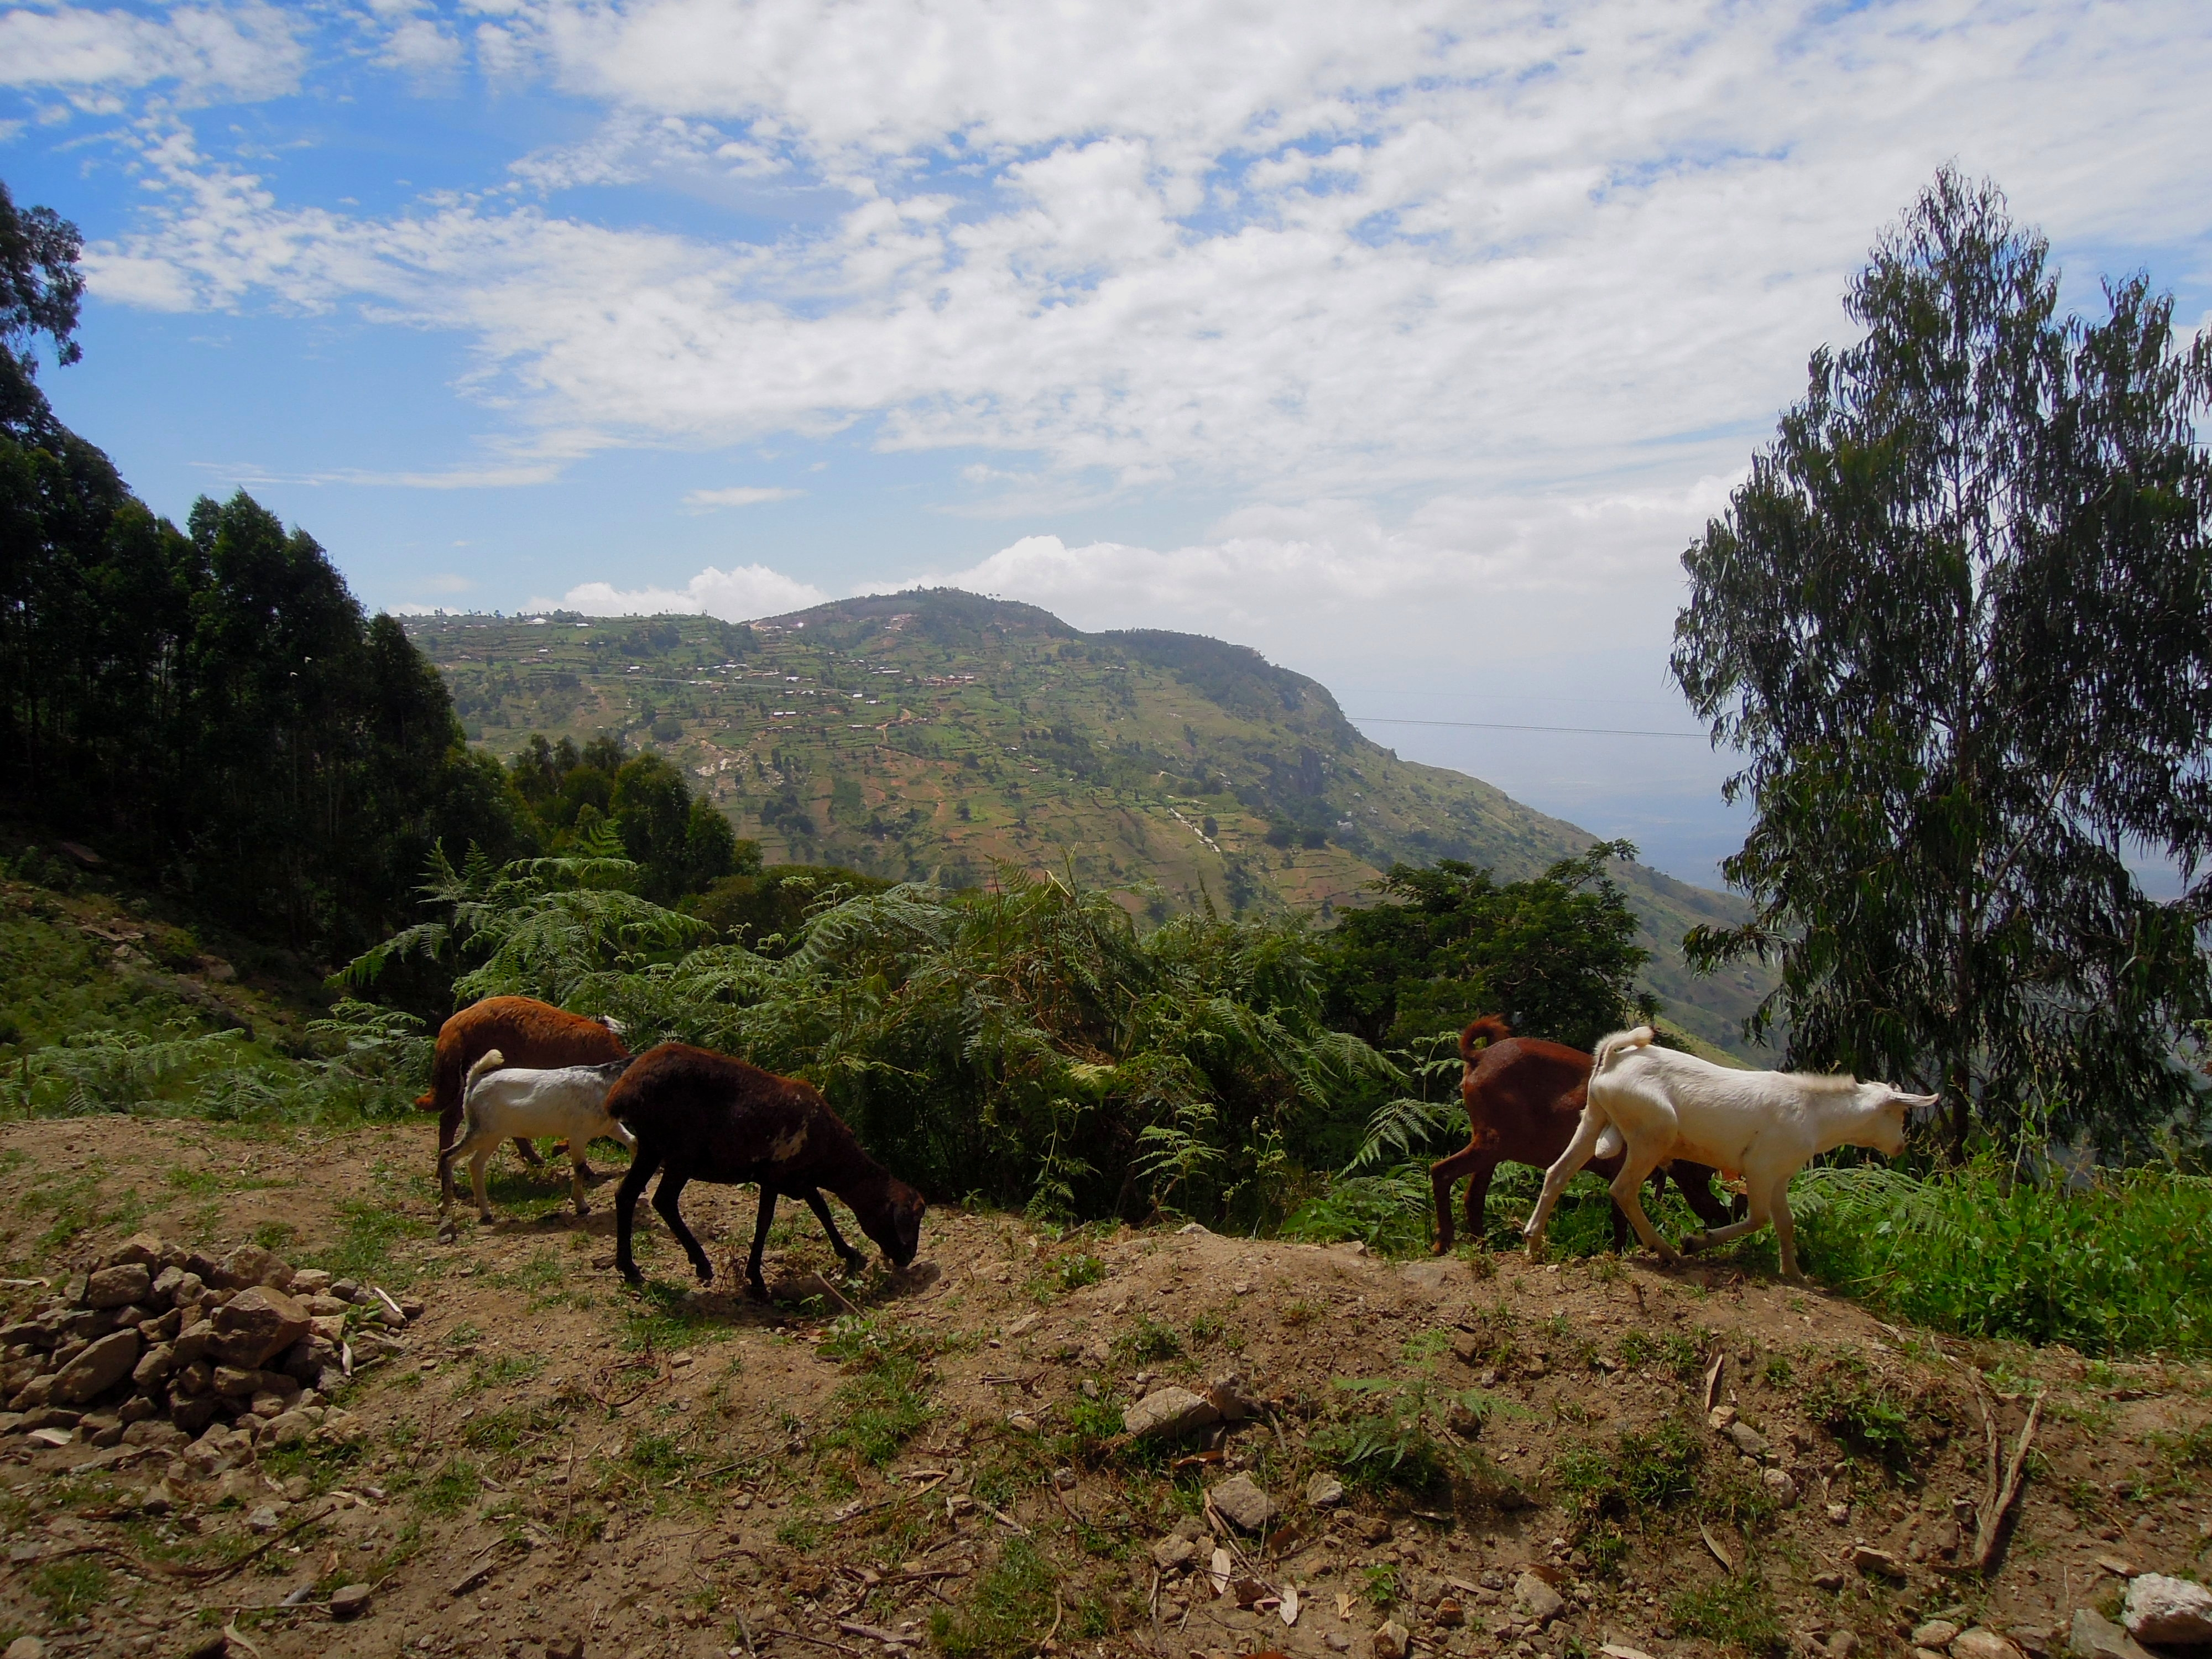 Między wioskami Mtae i Mambo, Usambara Mountains, Tanzania, fot. A. Mielczarek